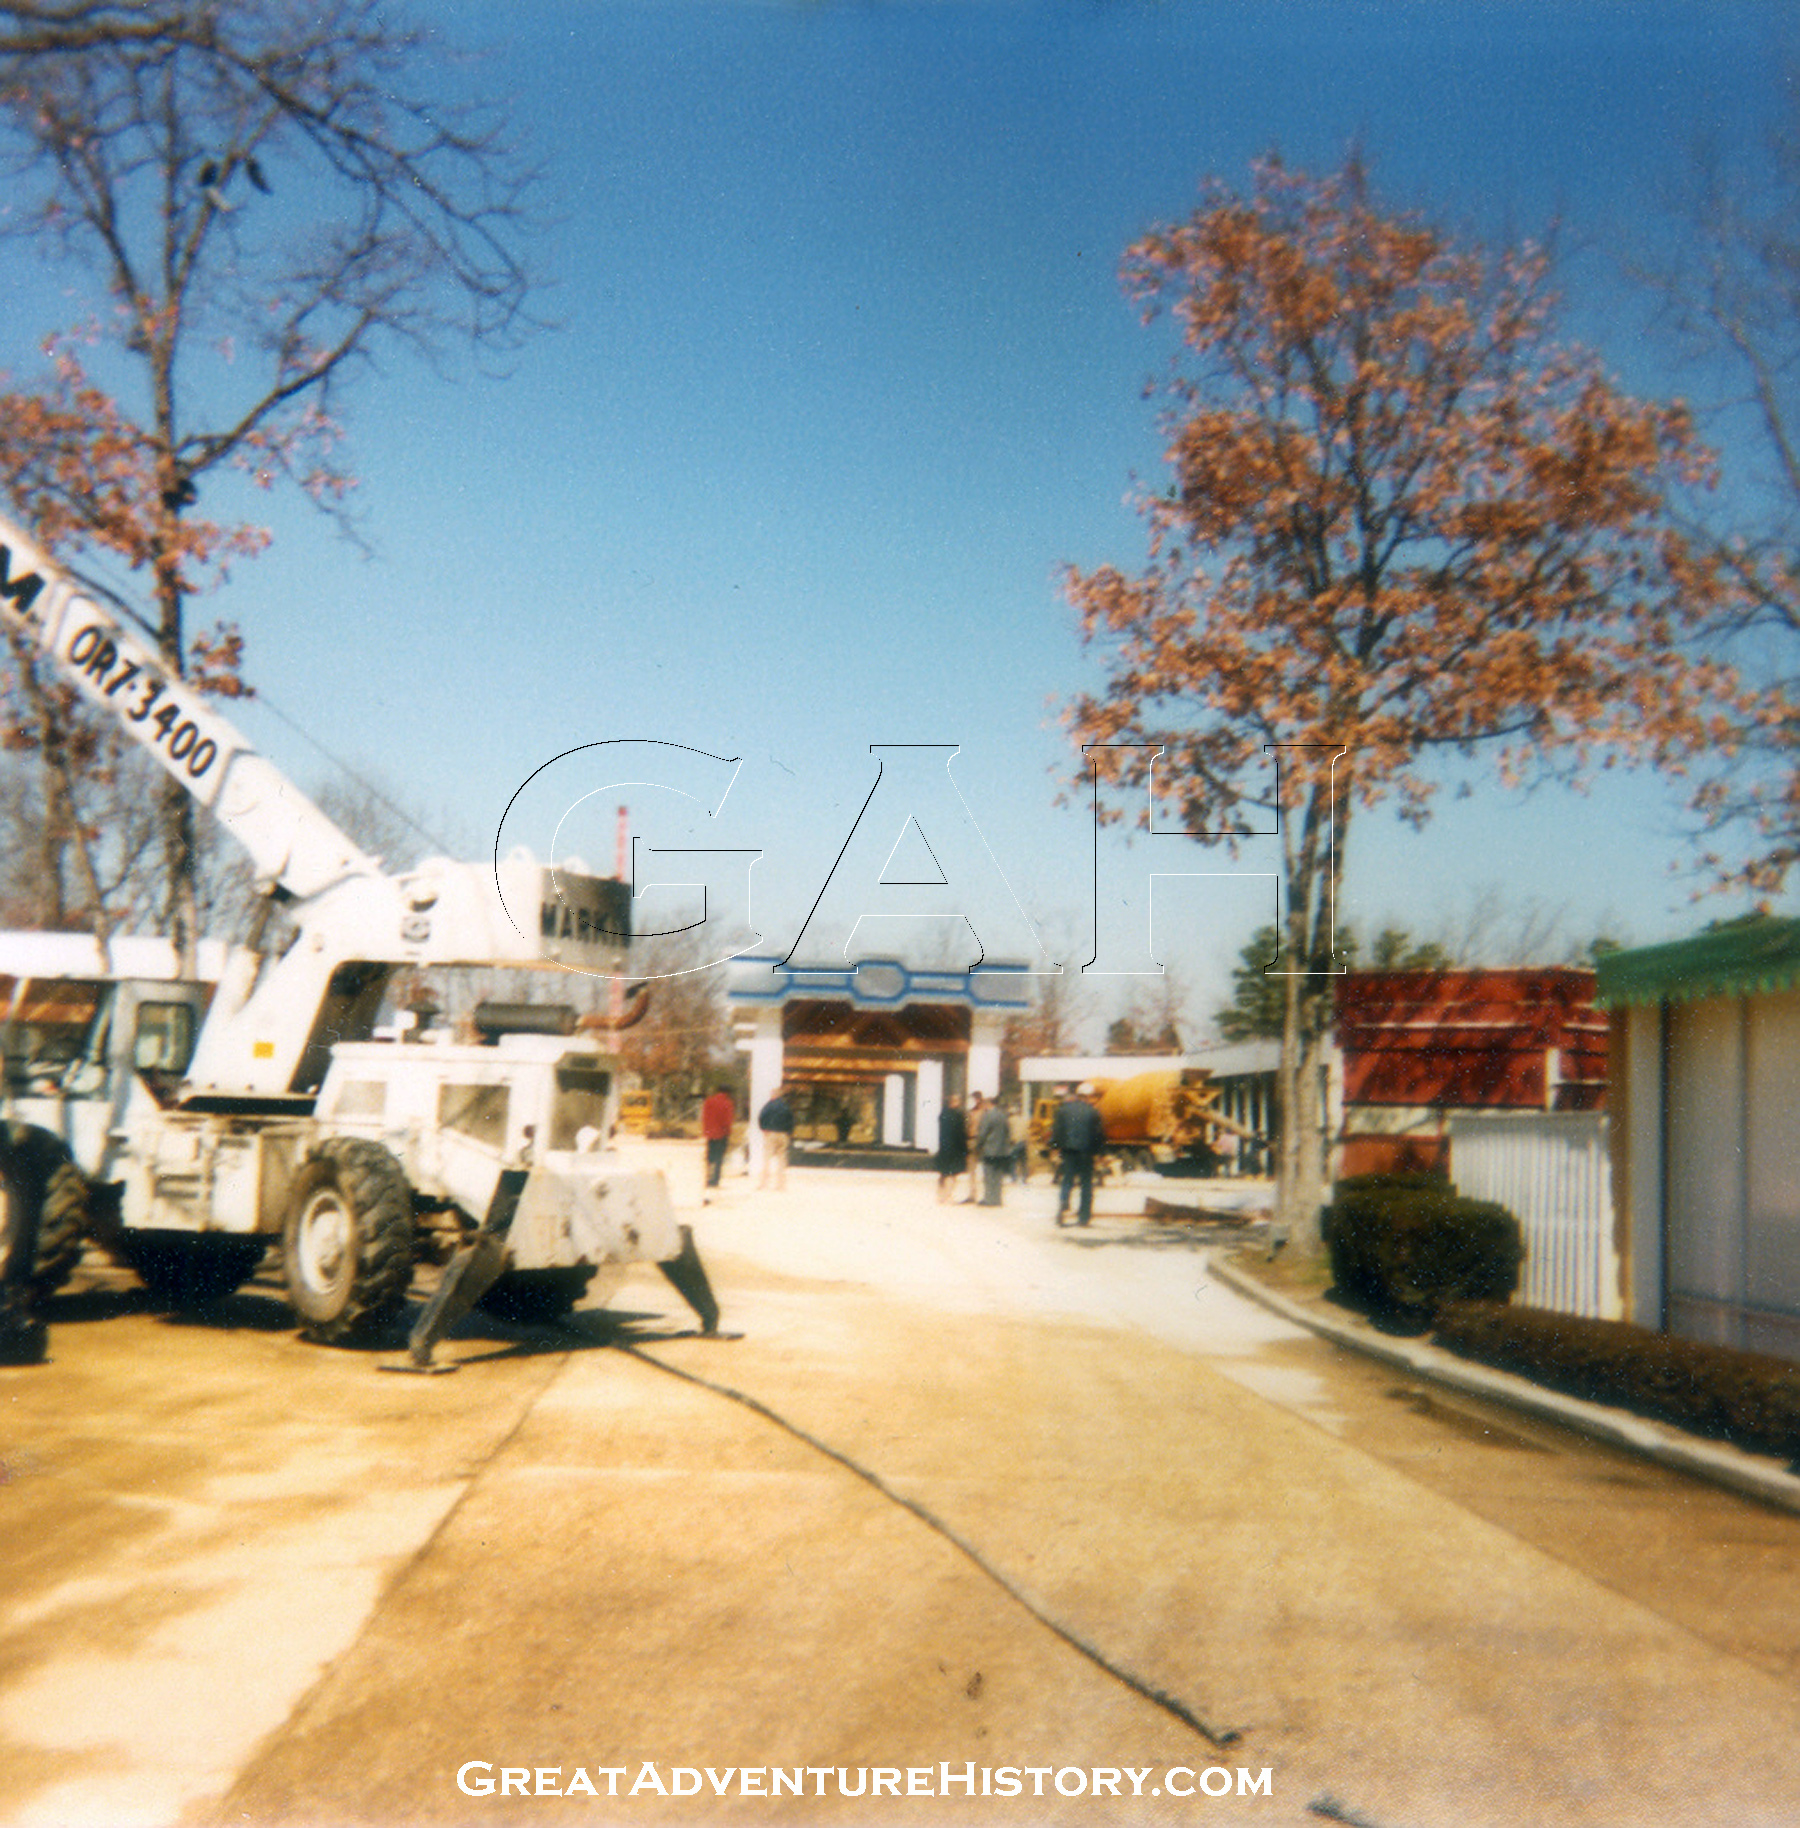 1982-Goodtime-Alley.jpg